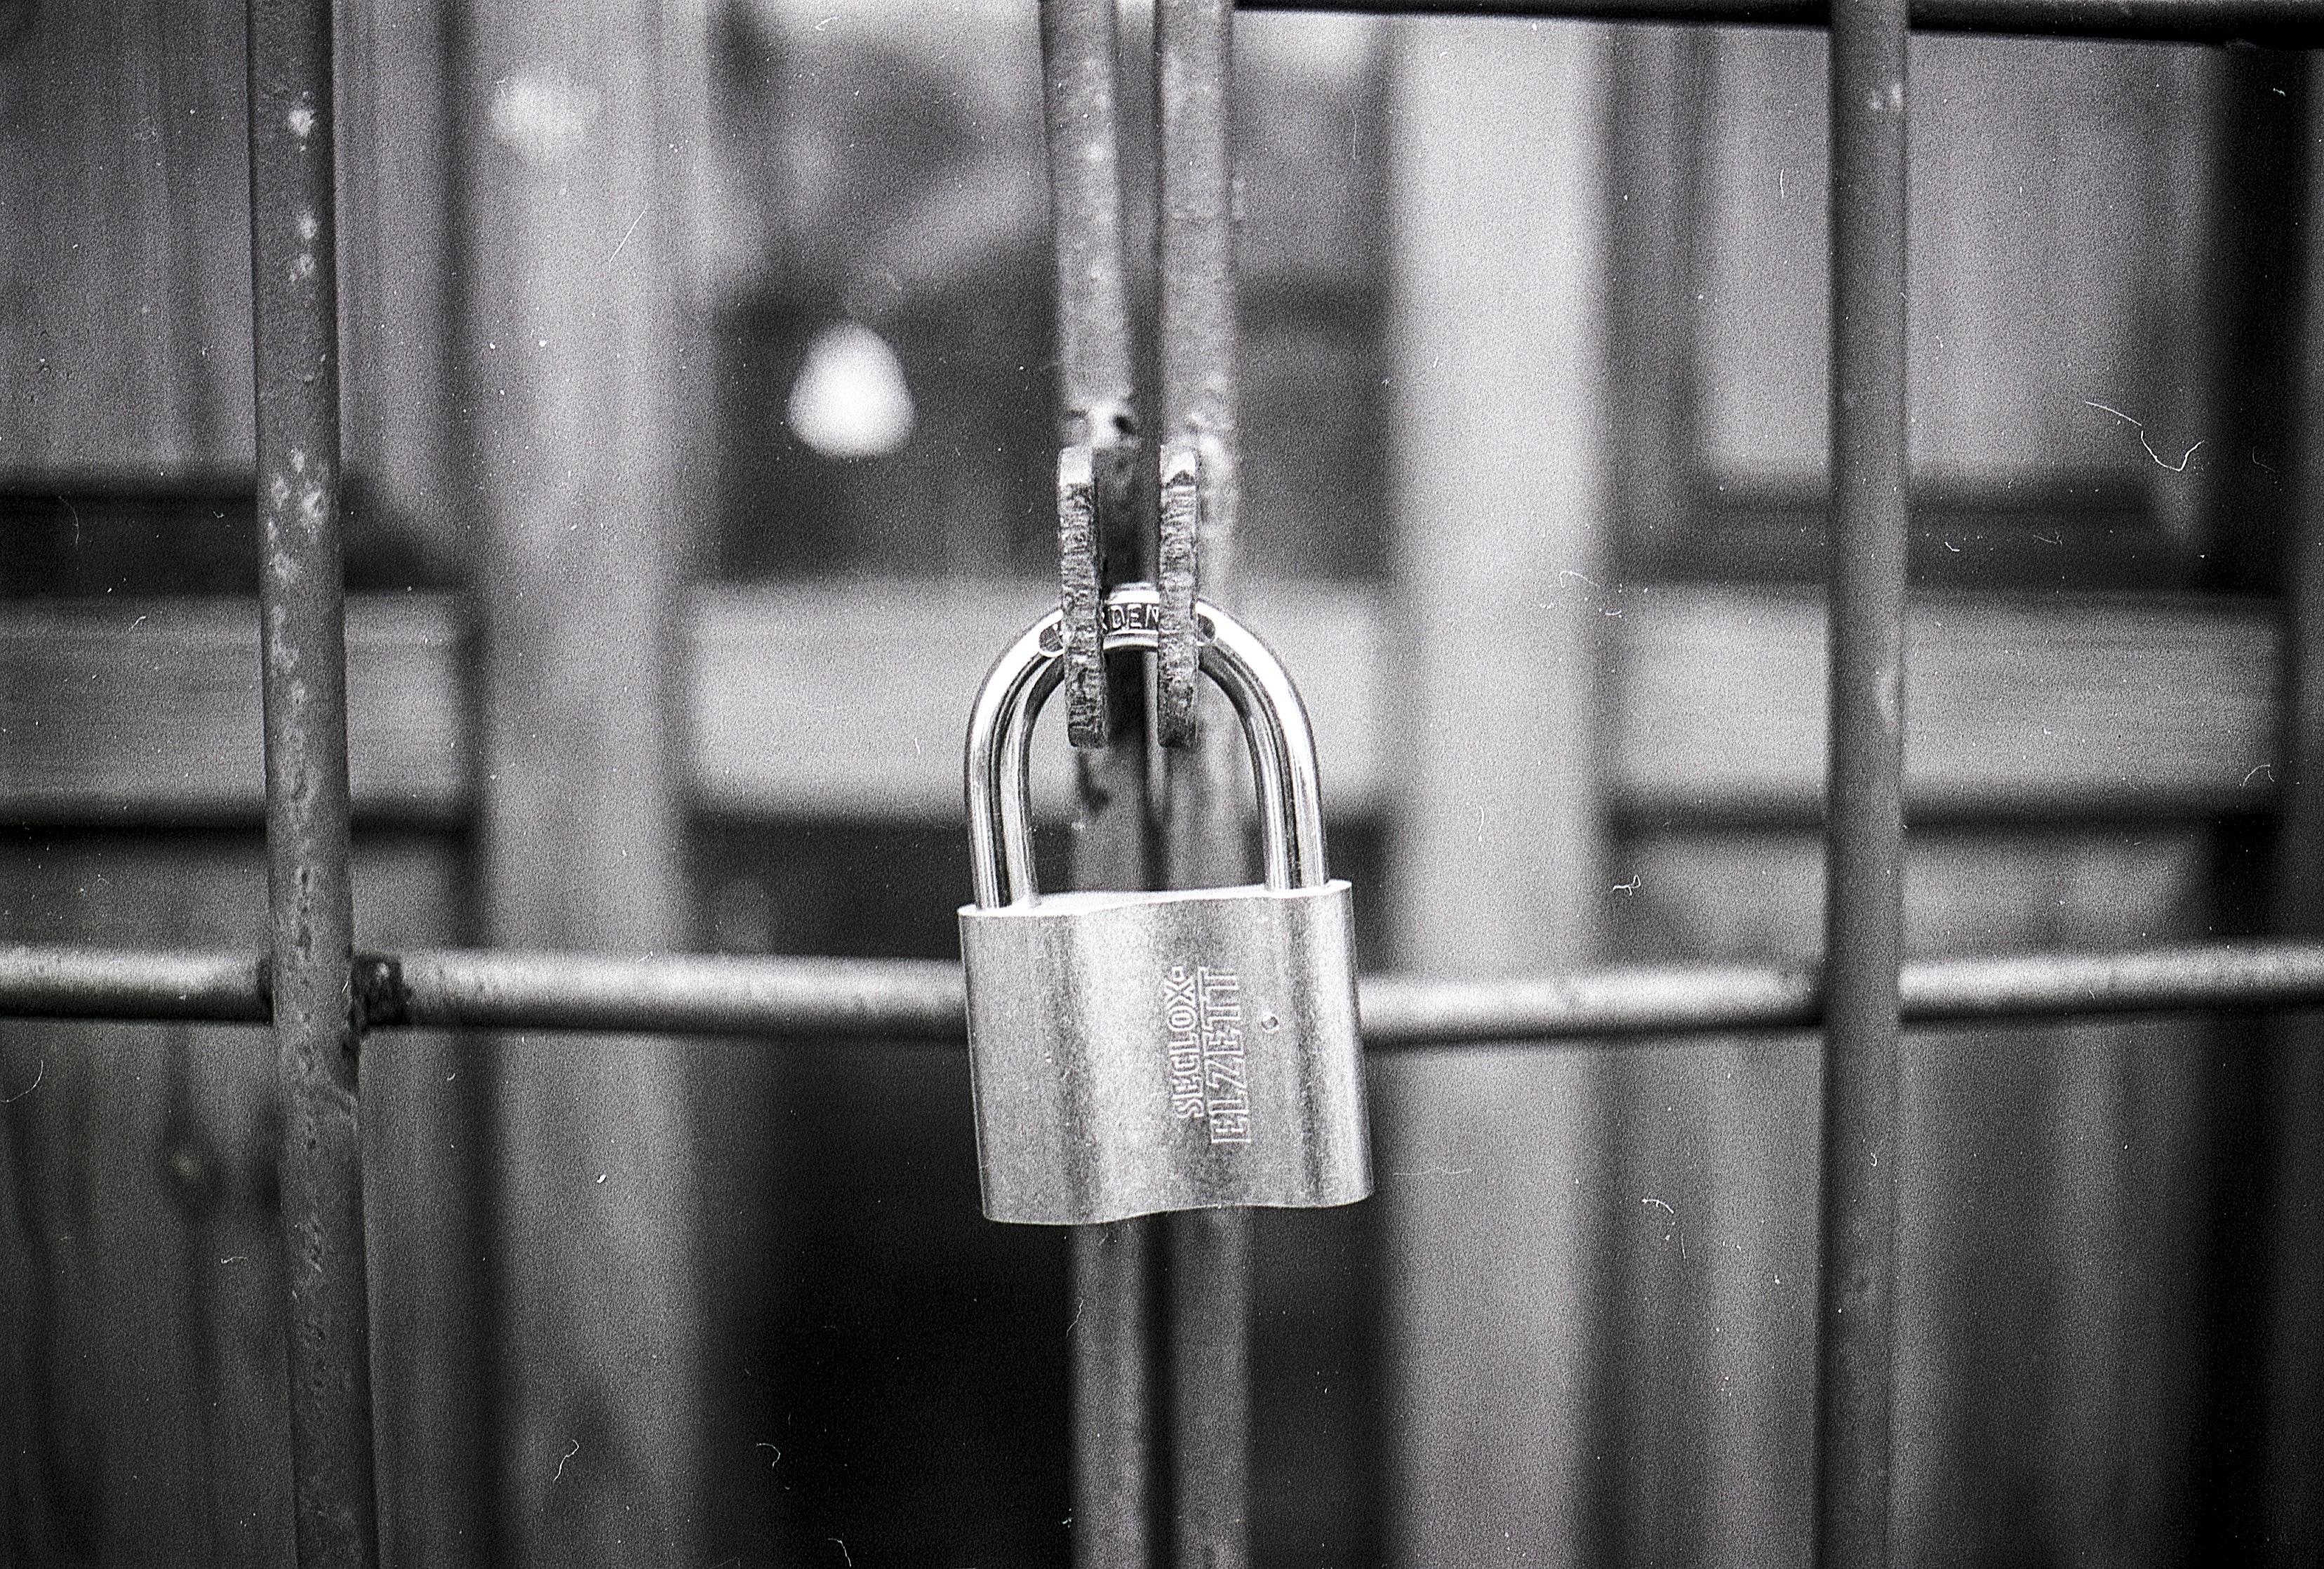 access-black-and-white-blur-270514-1